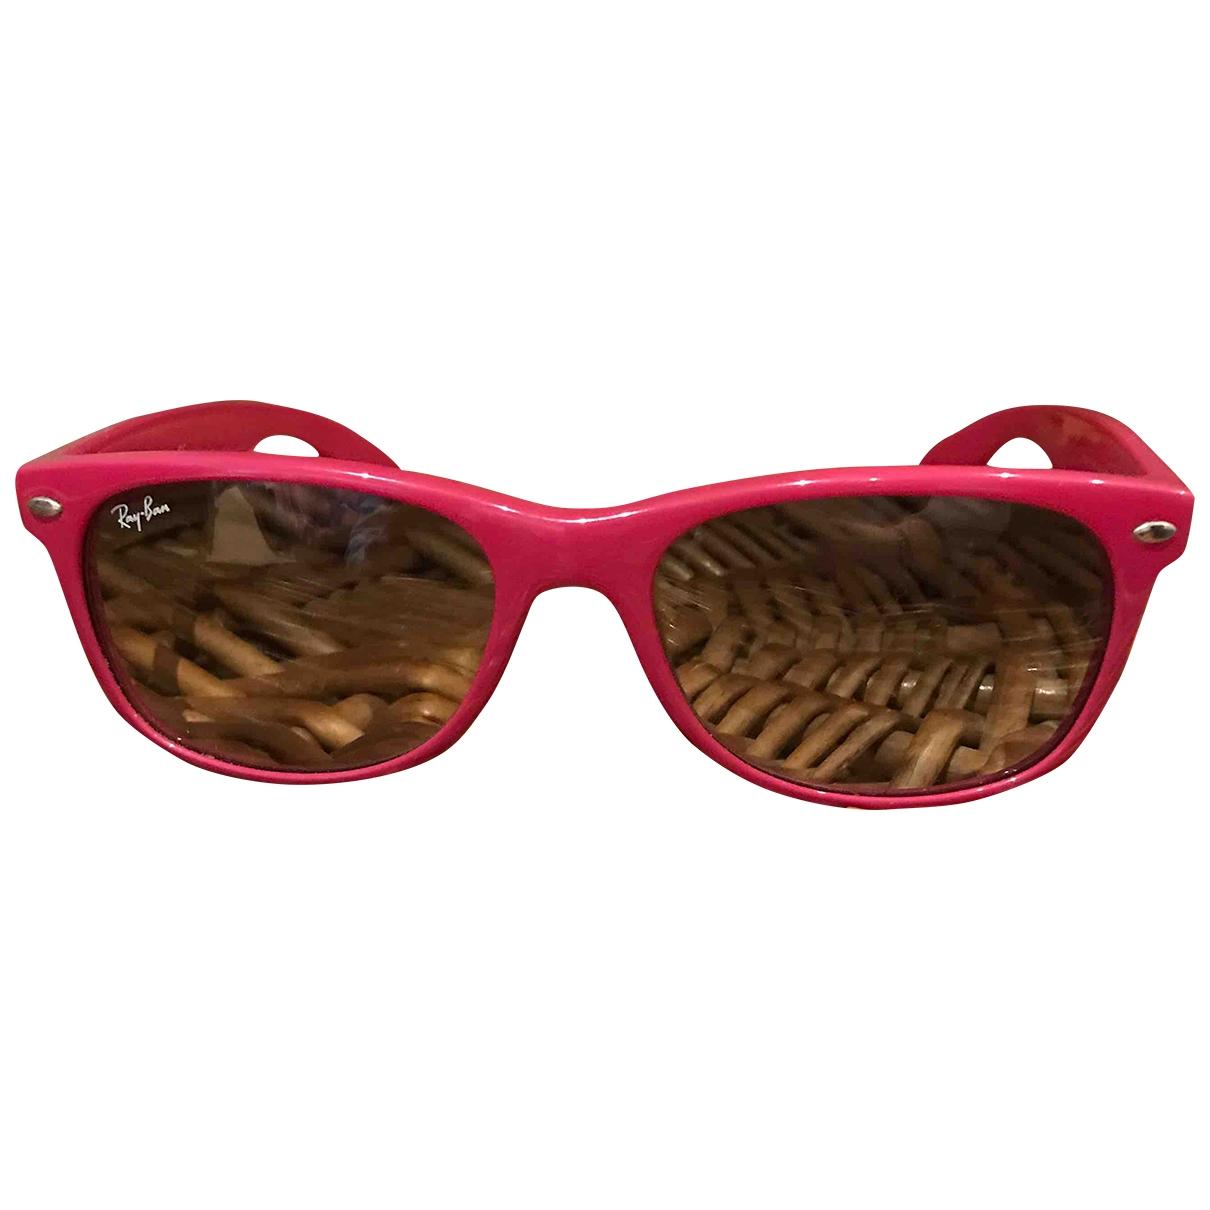 Ray-ban New Wayfarer Pink Sunglasses for Women \N